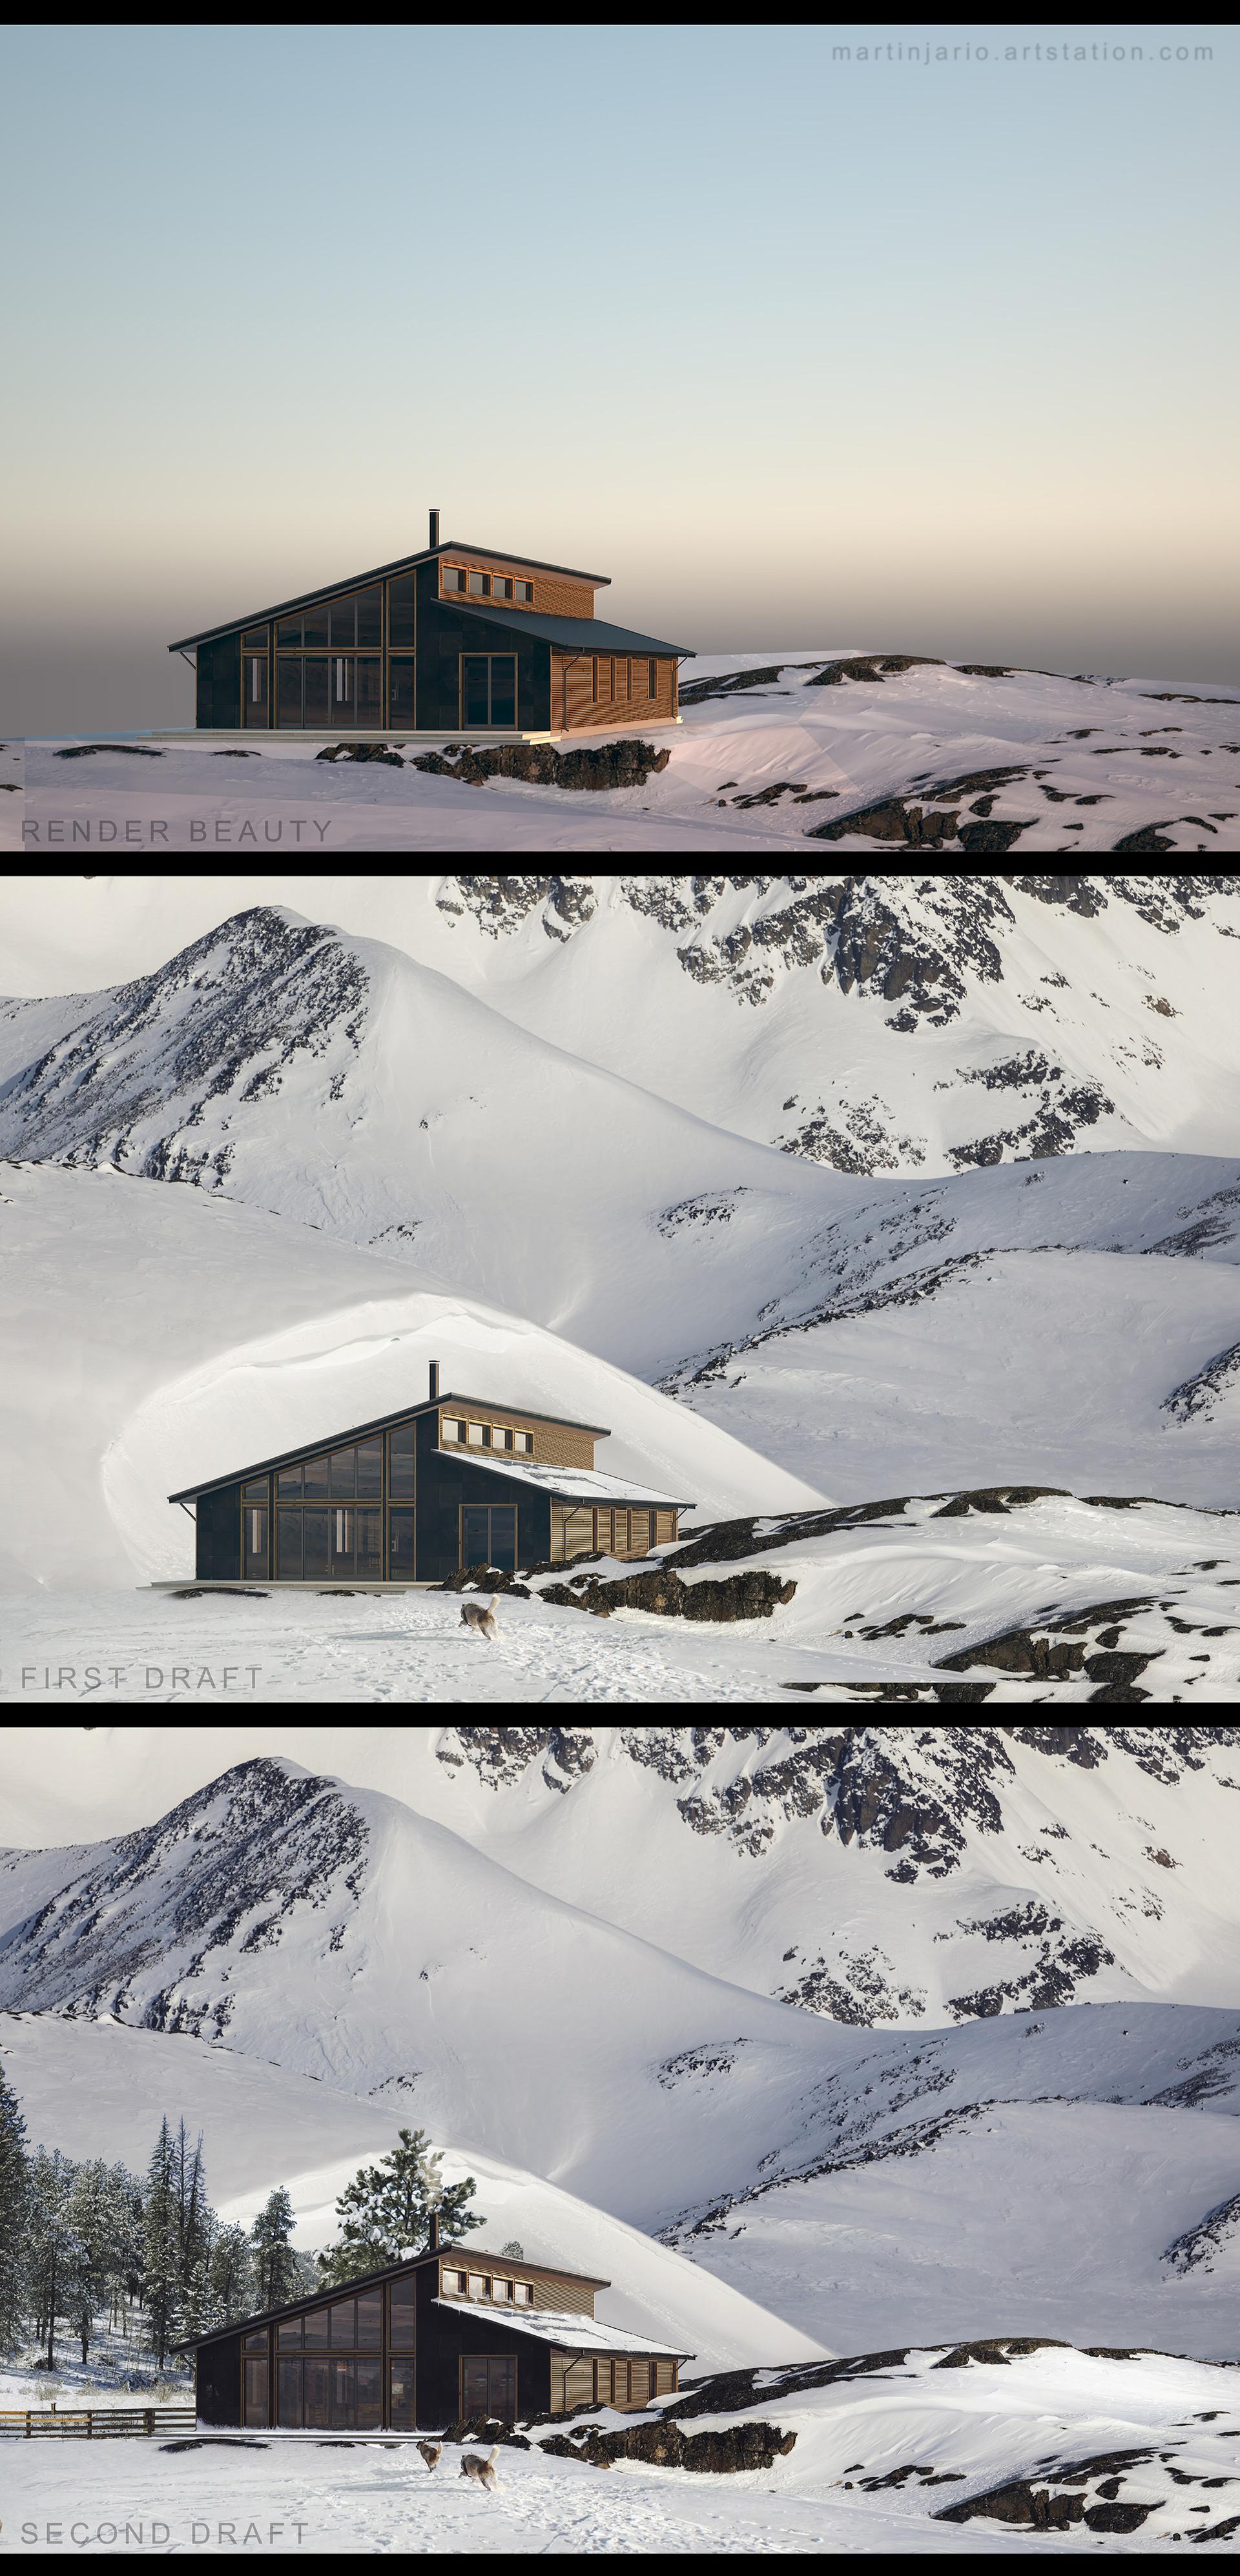 Martin jario artstation martinjario snowy mountains process